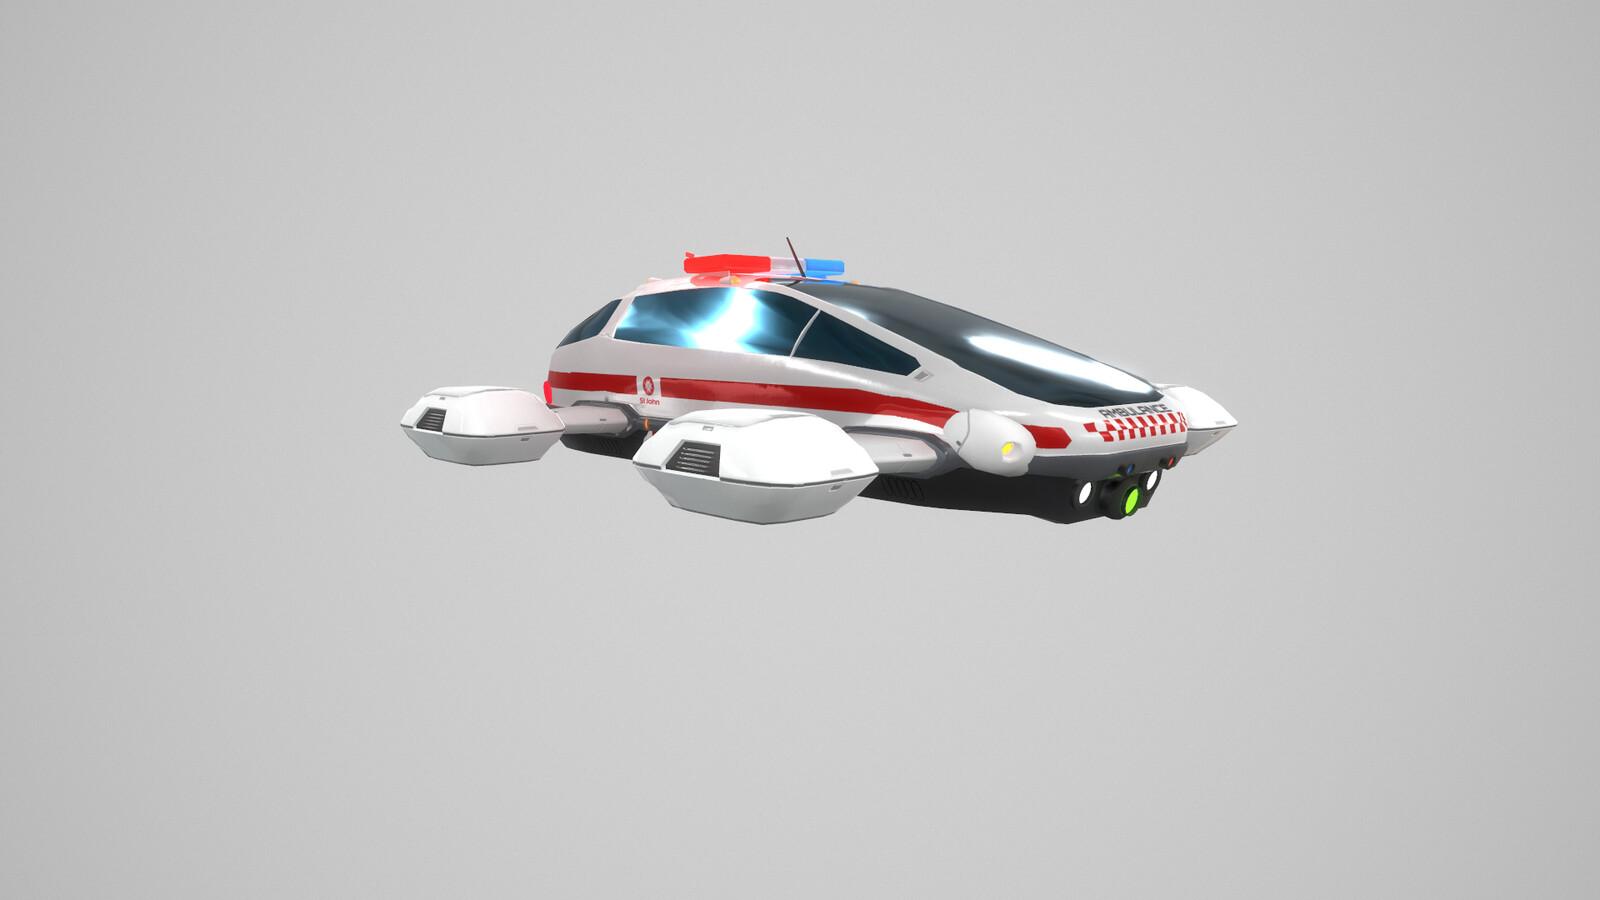 VR Stylized sci fi flying ambulance